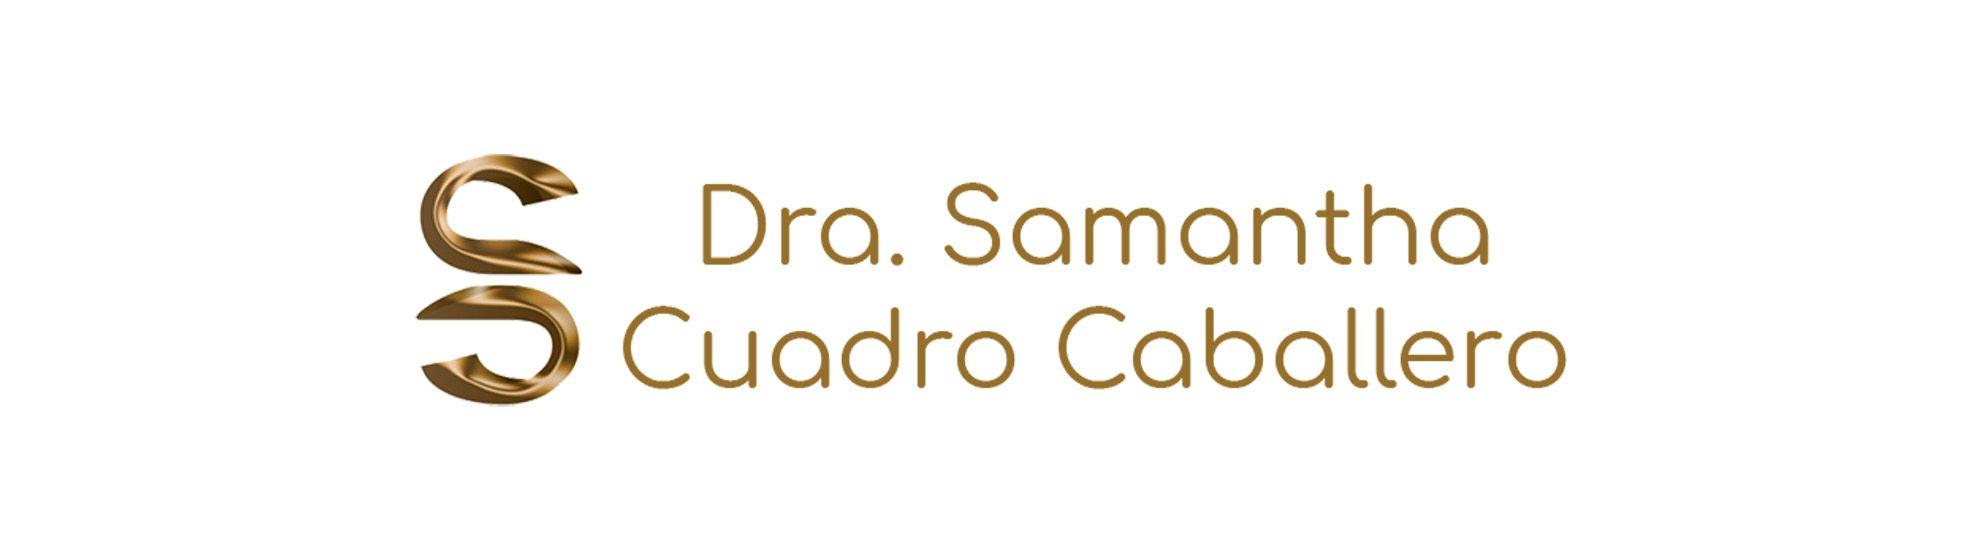 Samantha Cuadro